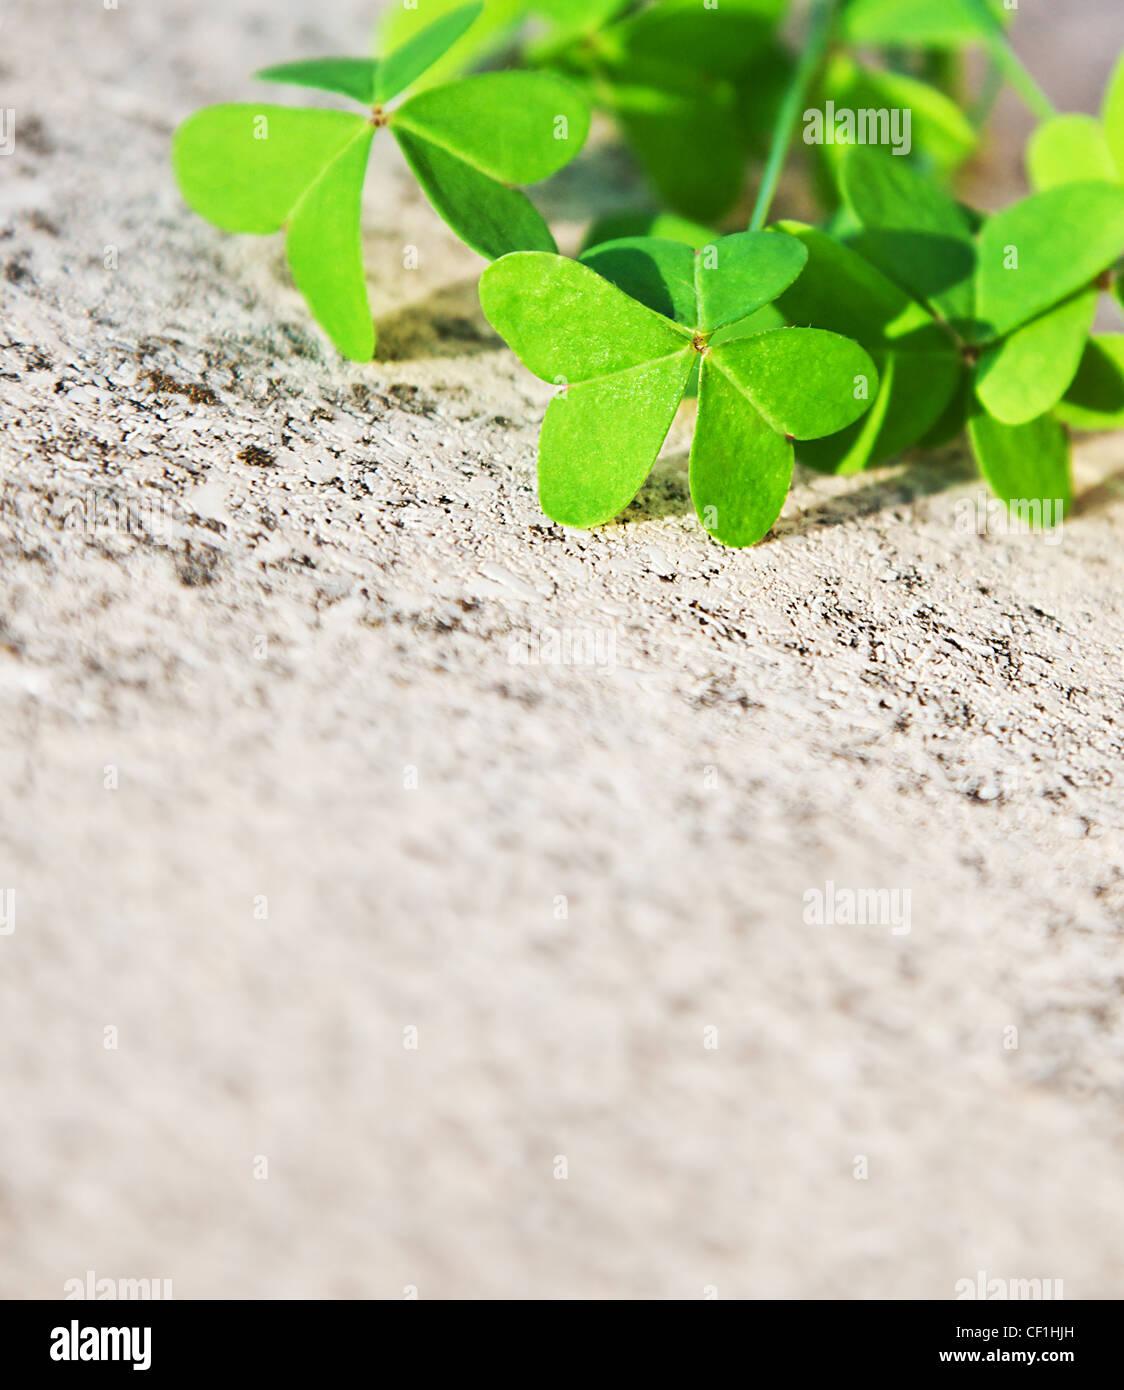 Hojas de trébol dulce sobre piedra, verde primavera borde floral, Lucky Shamrock, St.Patrick's day símbolo Imagen De Stock